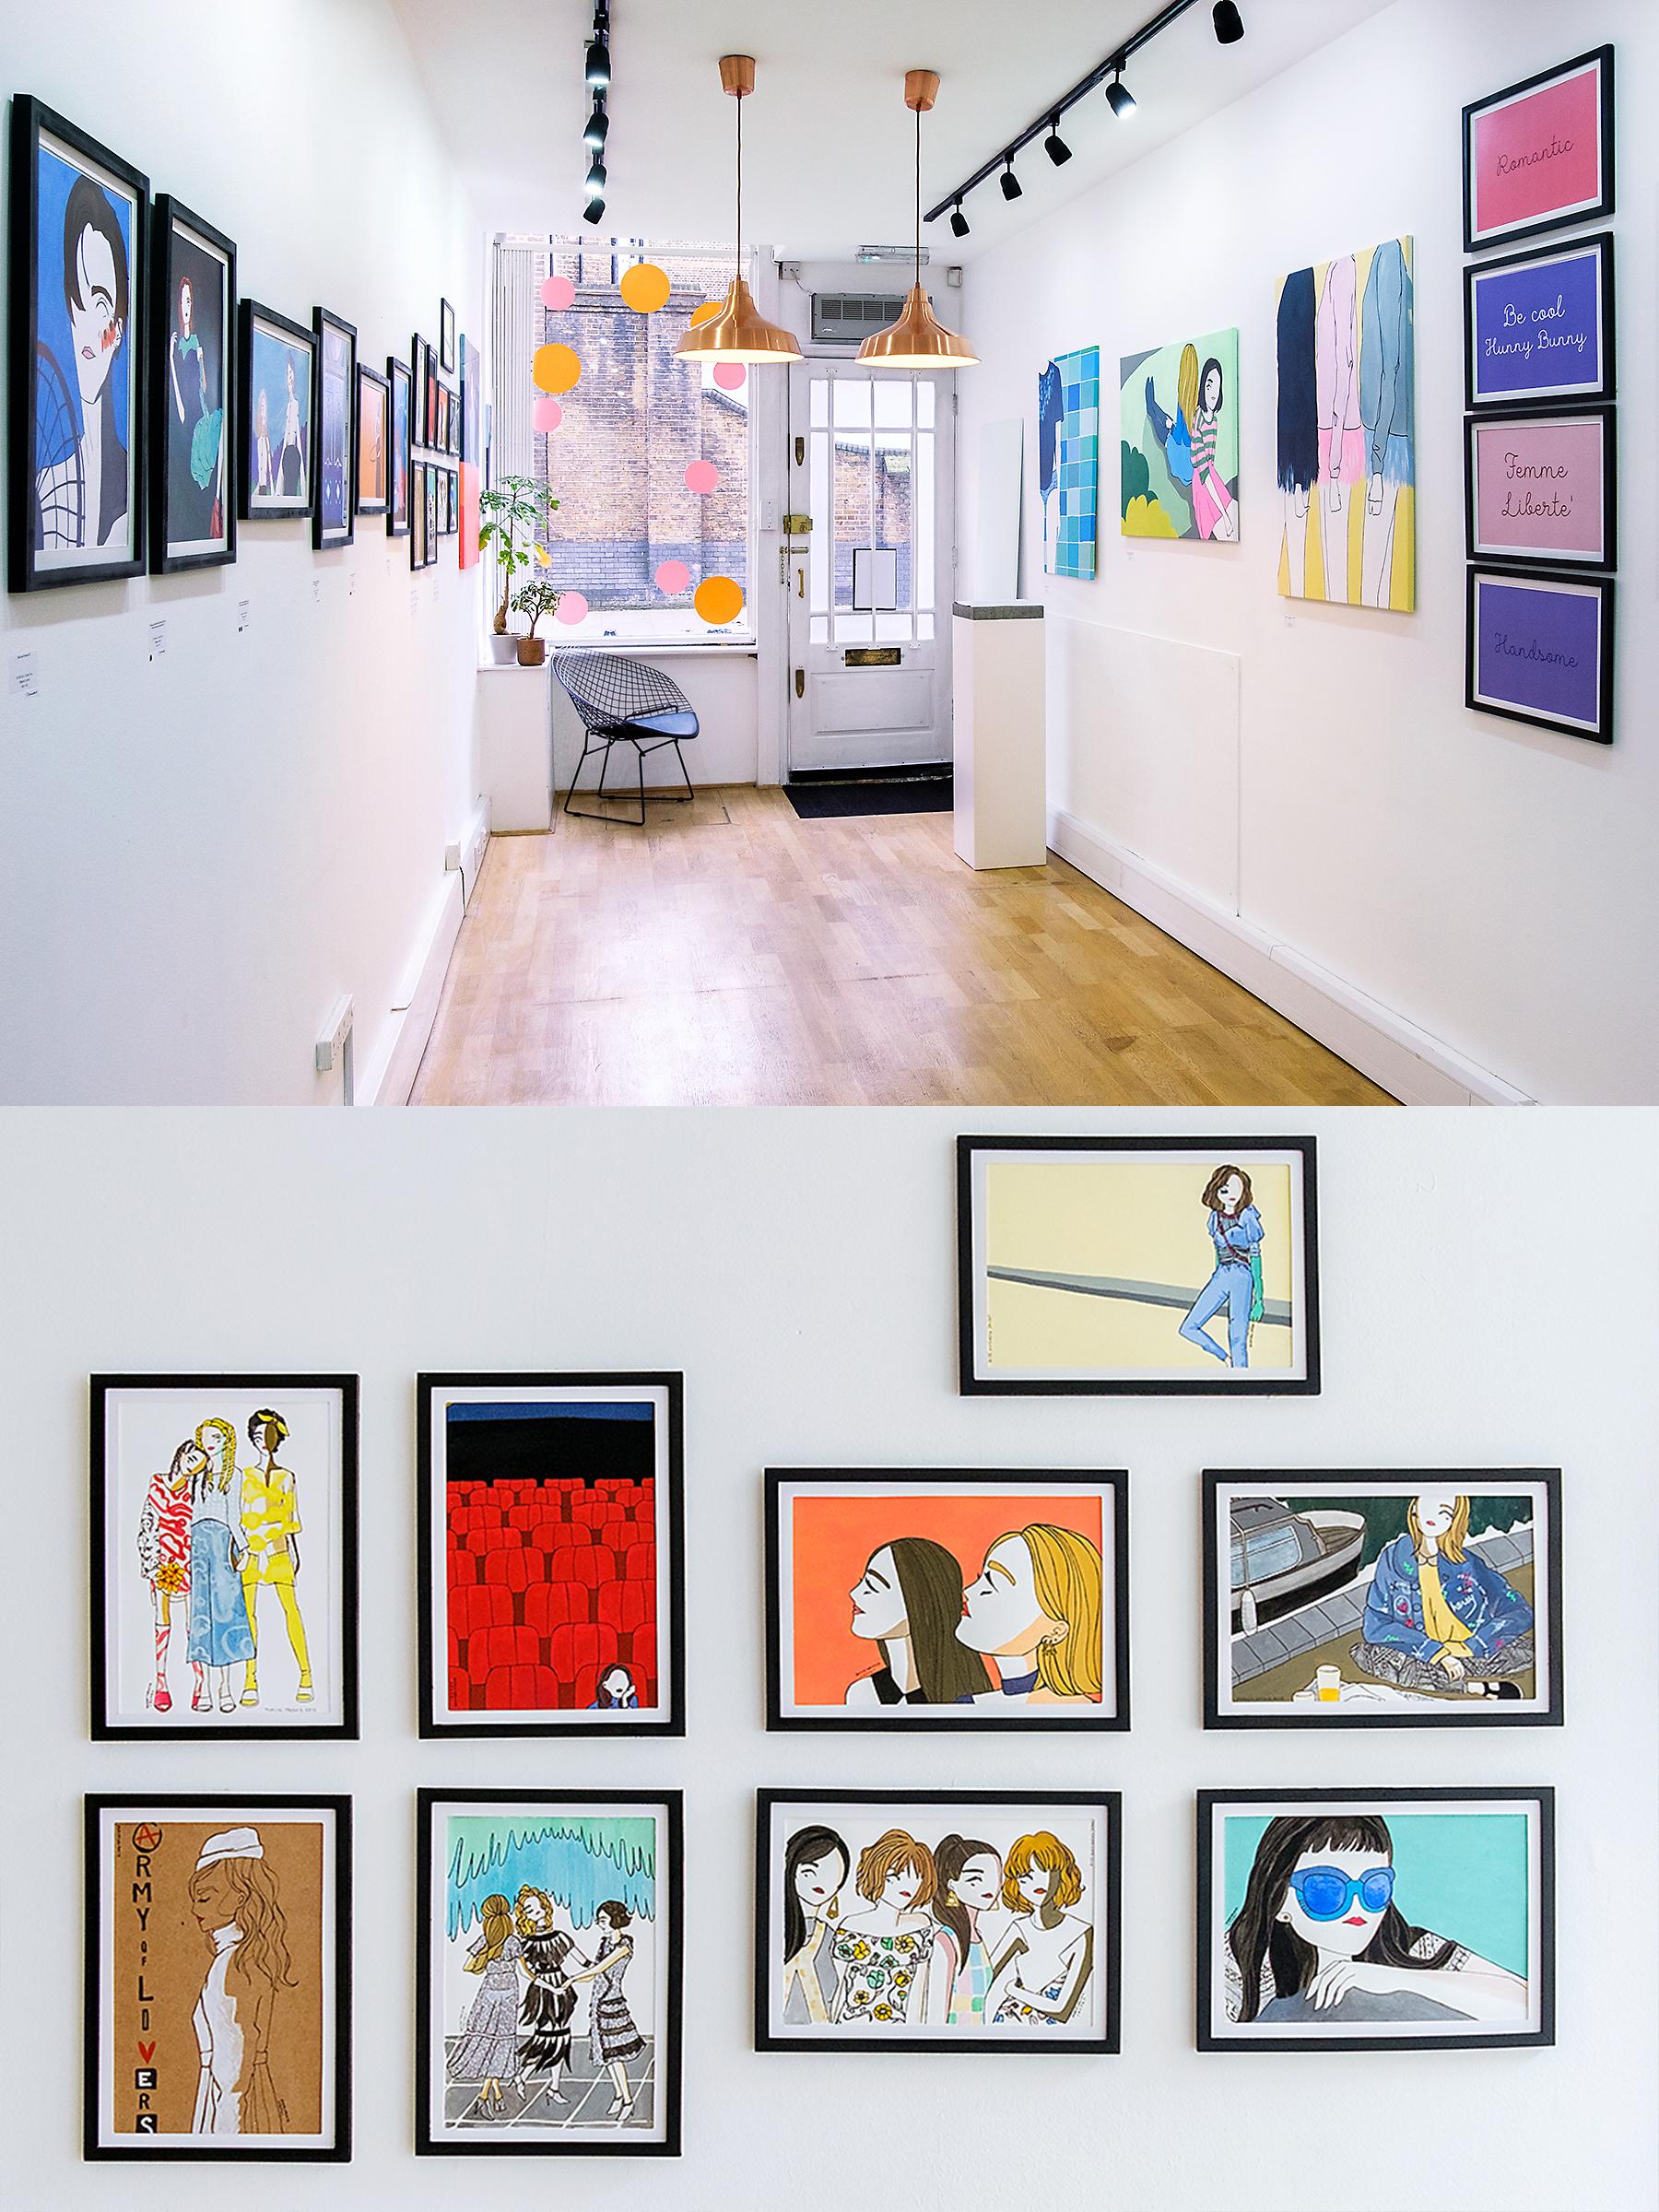 inno Art Gallery L'Art de Vivre by Rosa and Carlotta Crepax